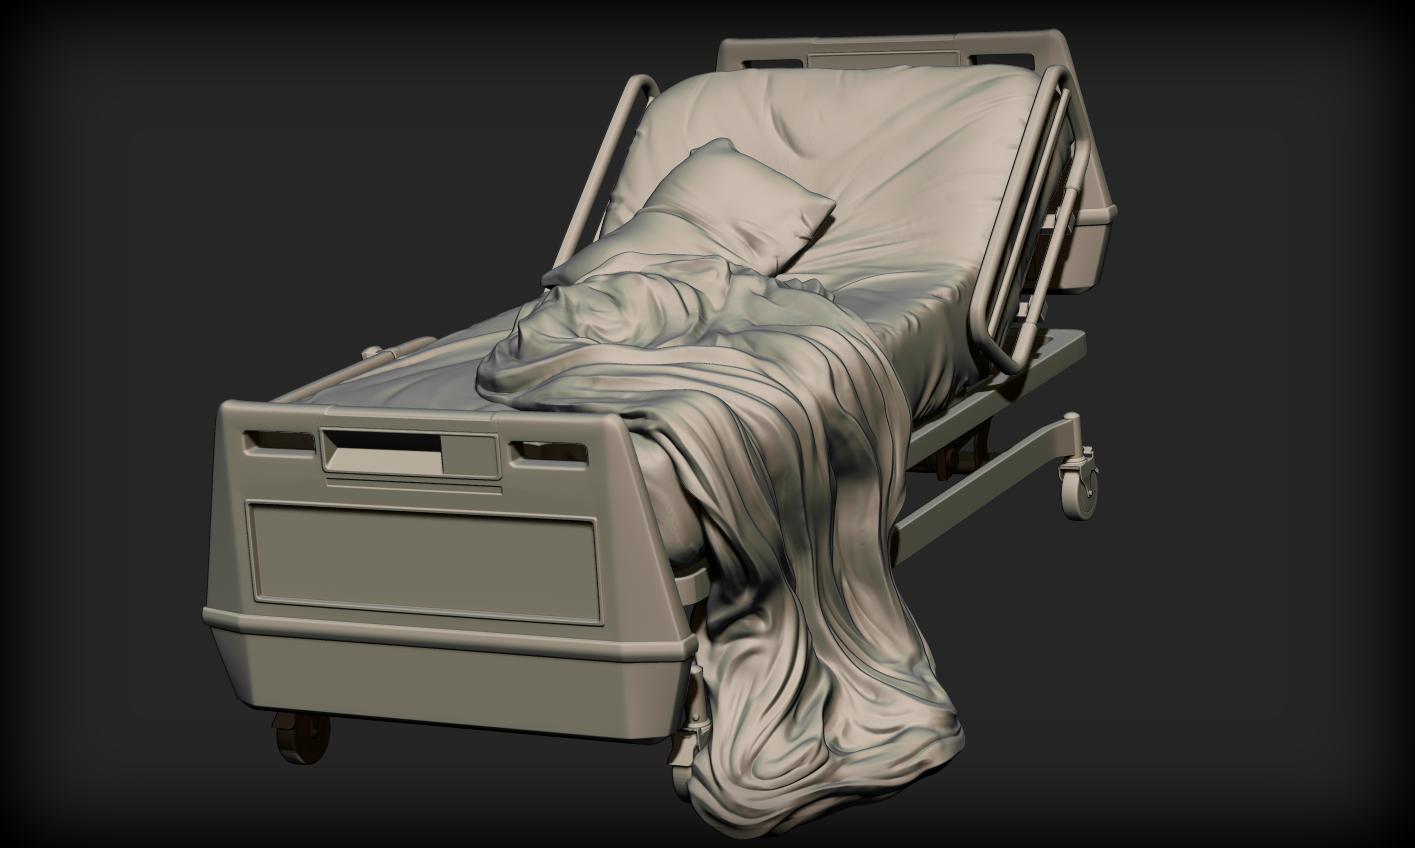 hospitalbed_render1.png